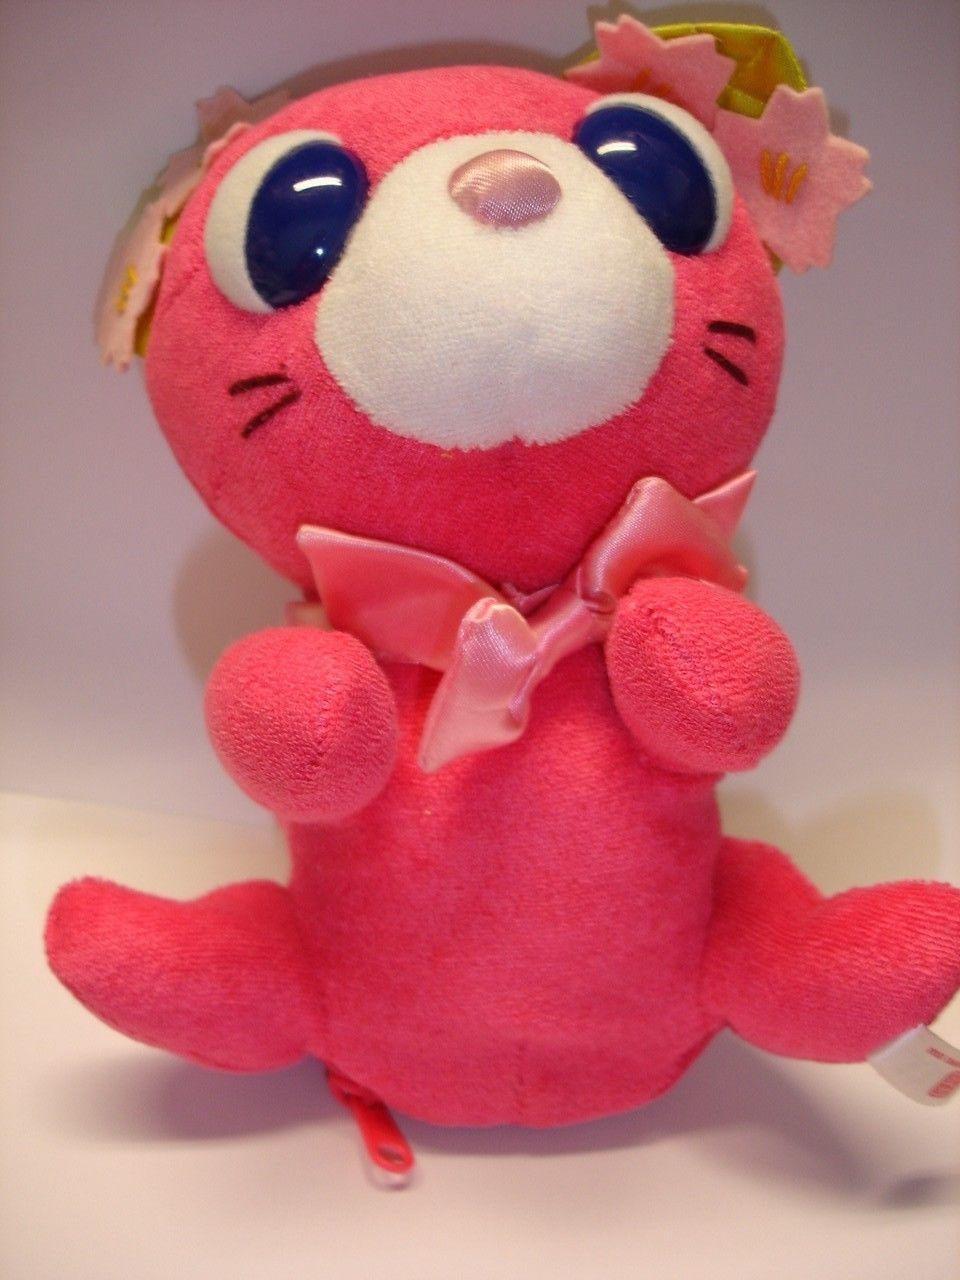 "Sega toys Horipro Ocha-Ken tea puppy Sakura 7.5"" cat plush stuffed doll figure"